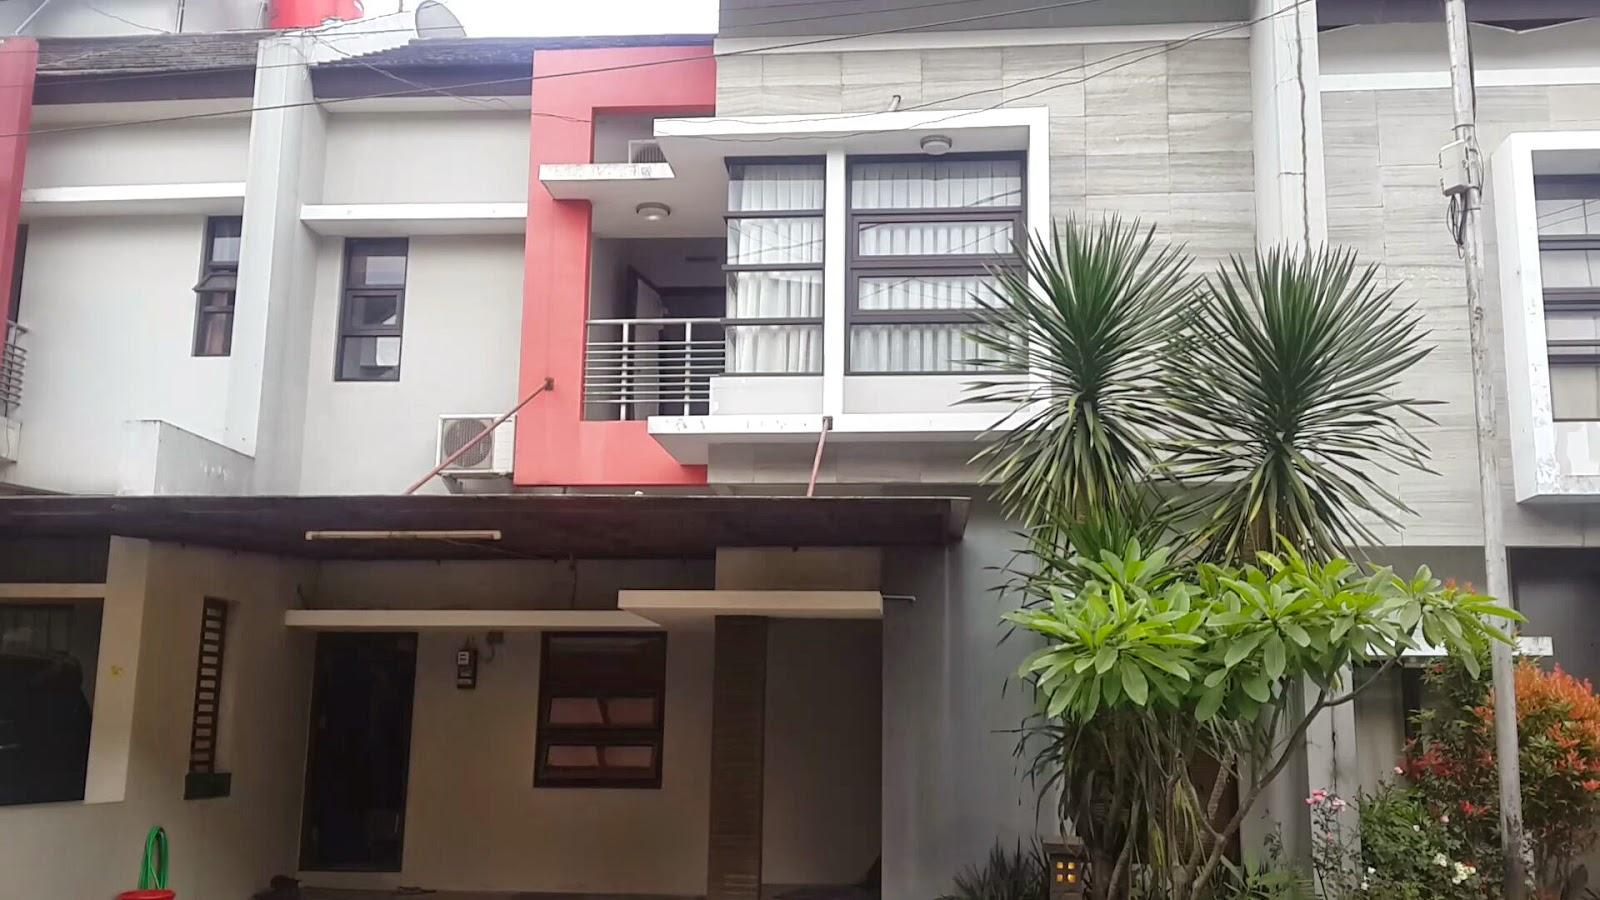 Rumah Dijual di Cluster cassa de esta Cigadung dago atas bandung tampak depan Desember 2014